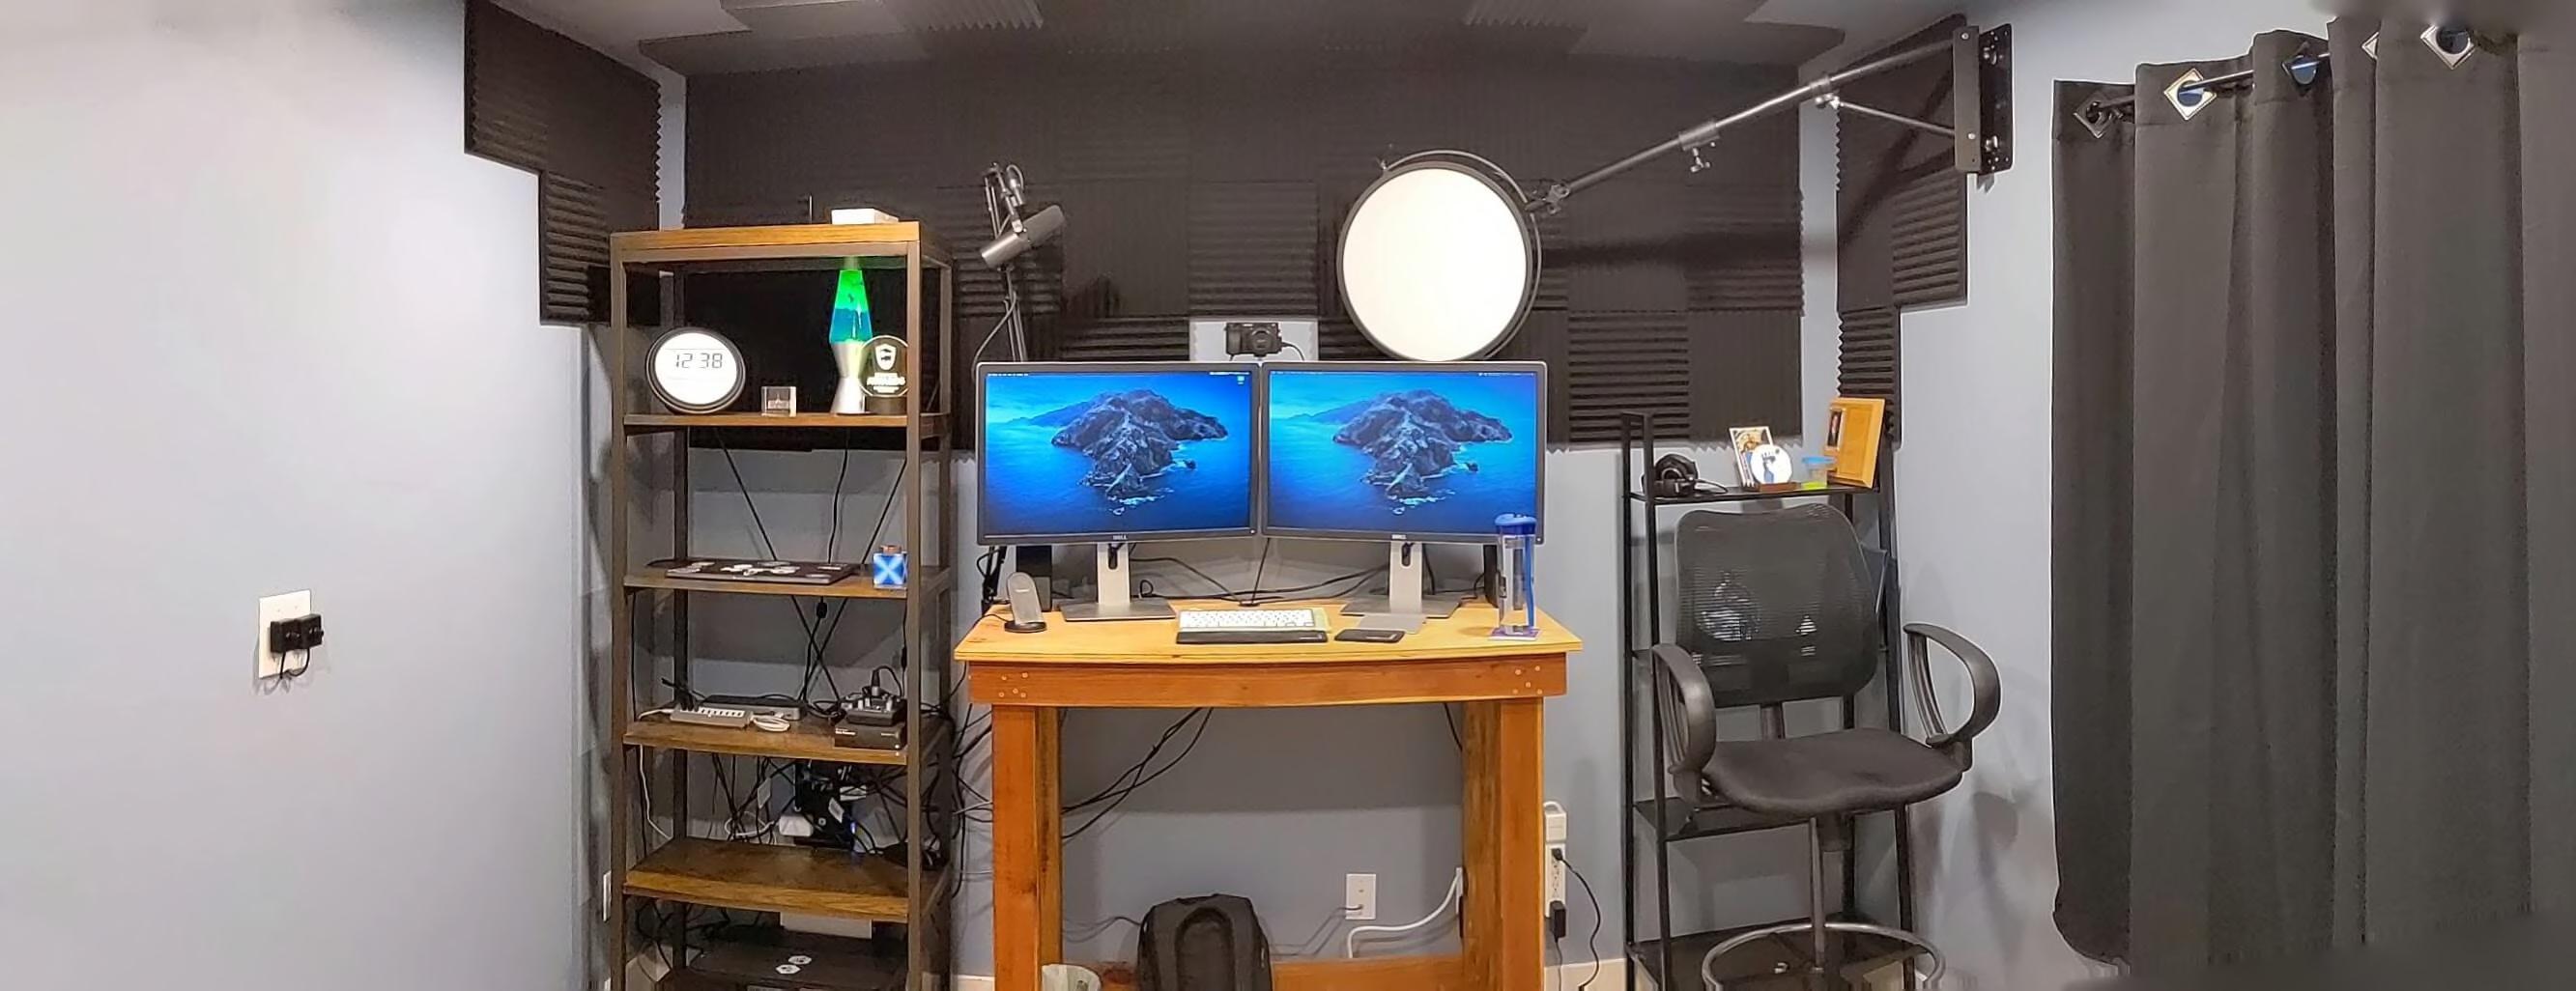 Kent's workspace